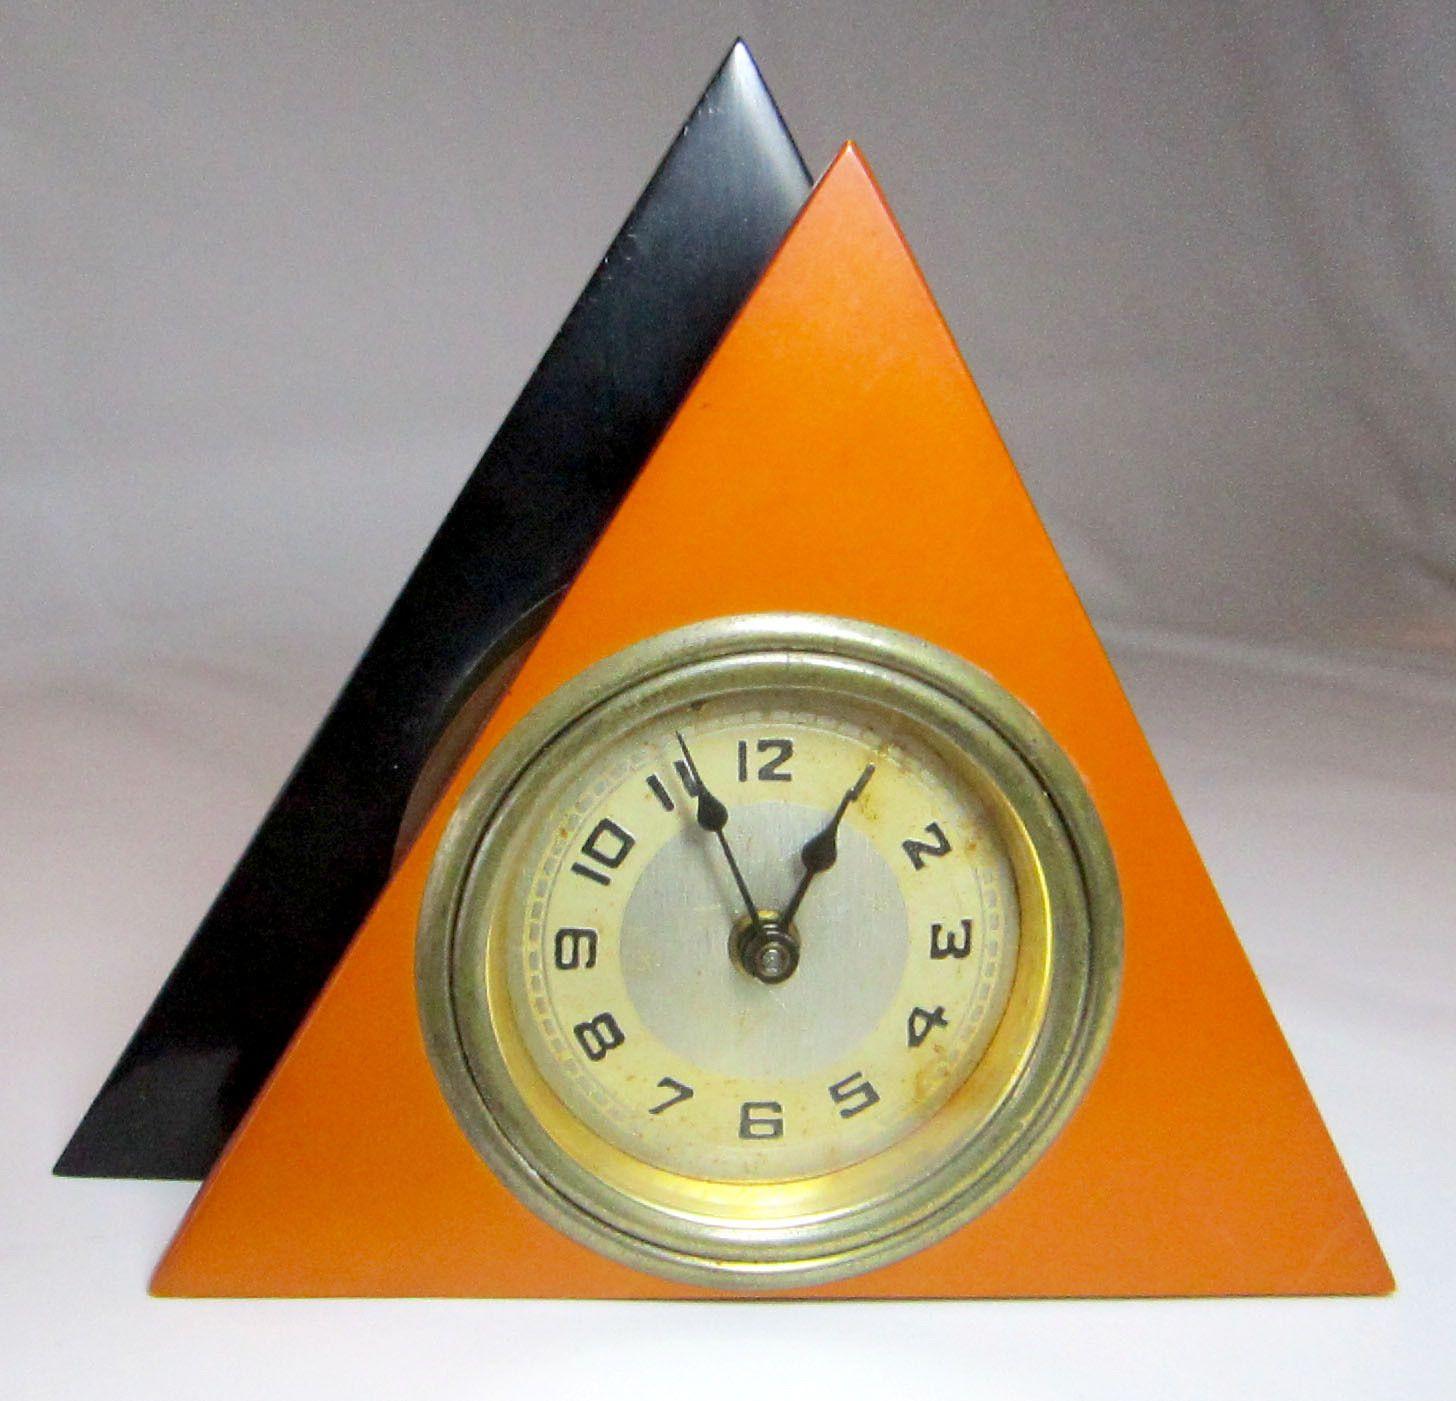 Horloge De Bureau Originale bakelite triangle tri-color deco moderne desk clock